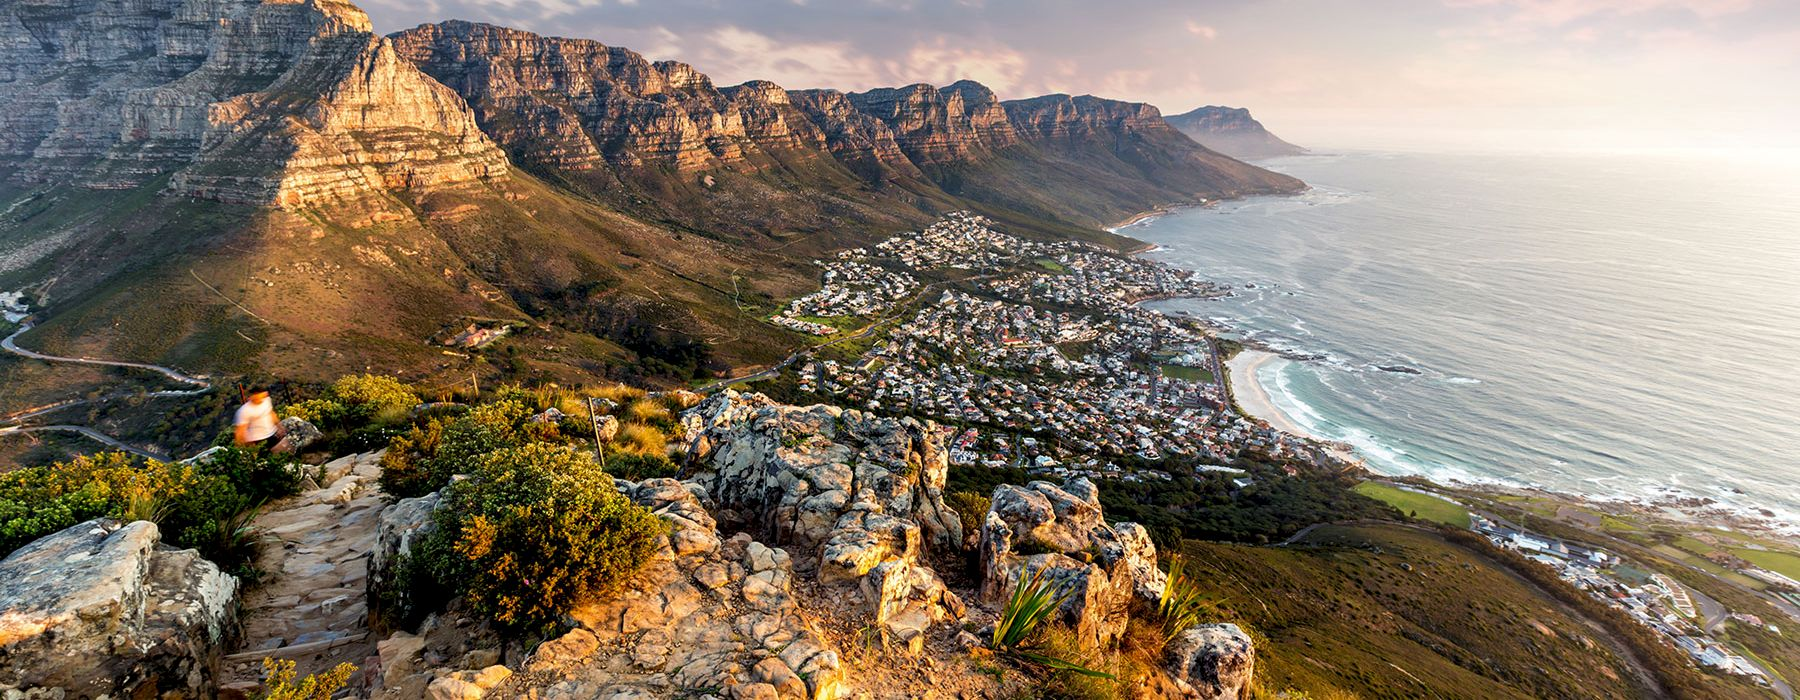 Compañía de alquiler Sudáfrica